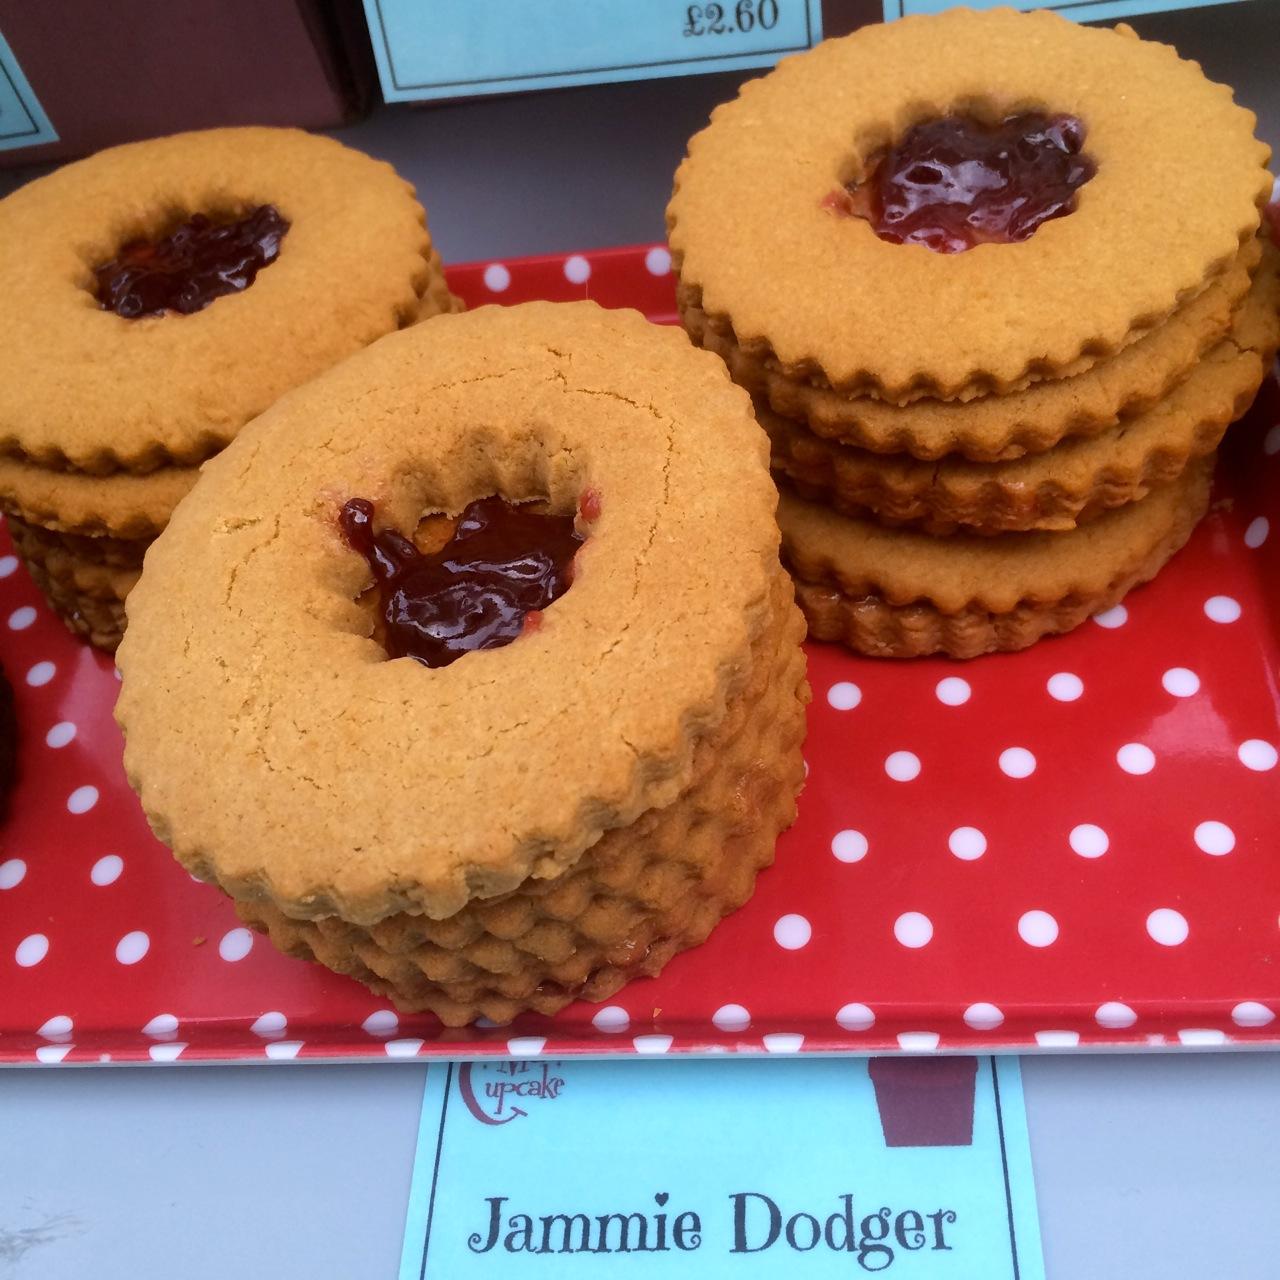 http://fatgayvegan.com/wp-content/uploads/2015/07/Jammie-Dodgers-by-Ms-Cupcake-at-Just-V-Show.jpg